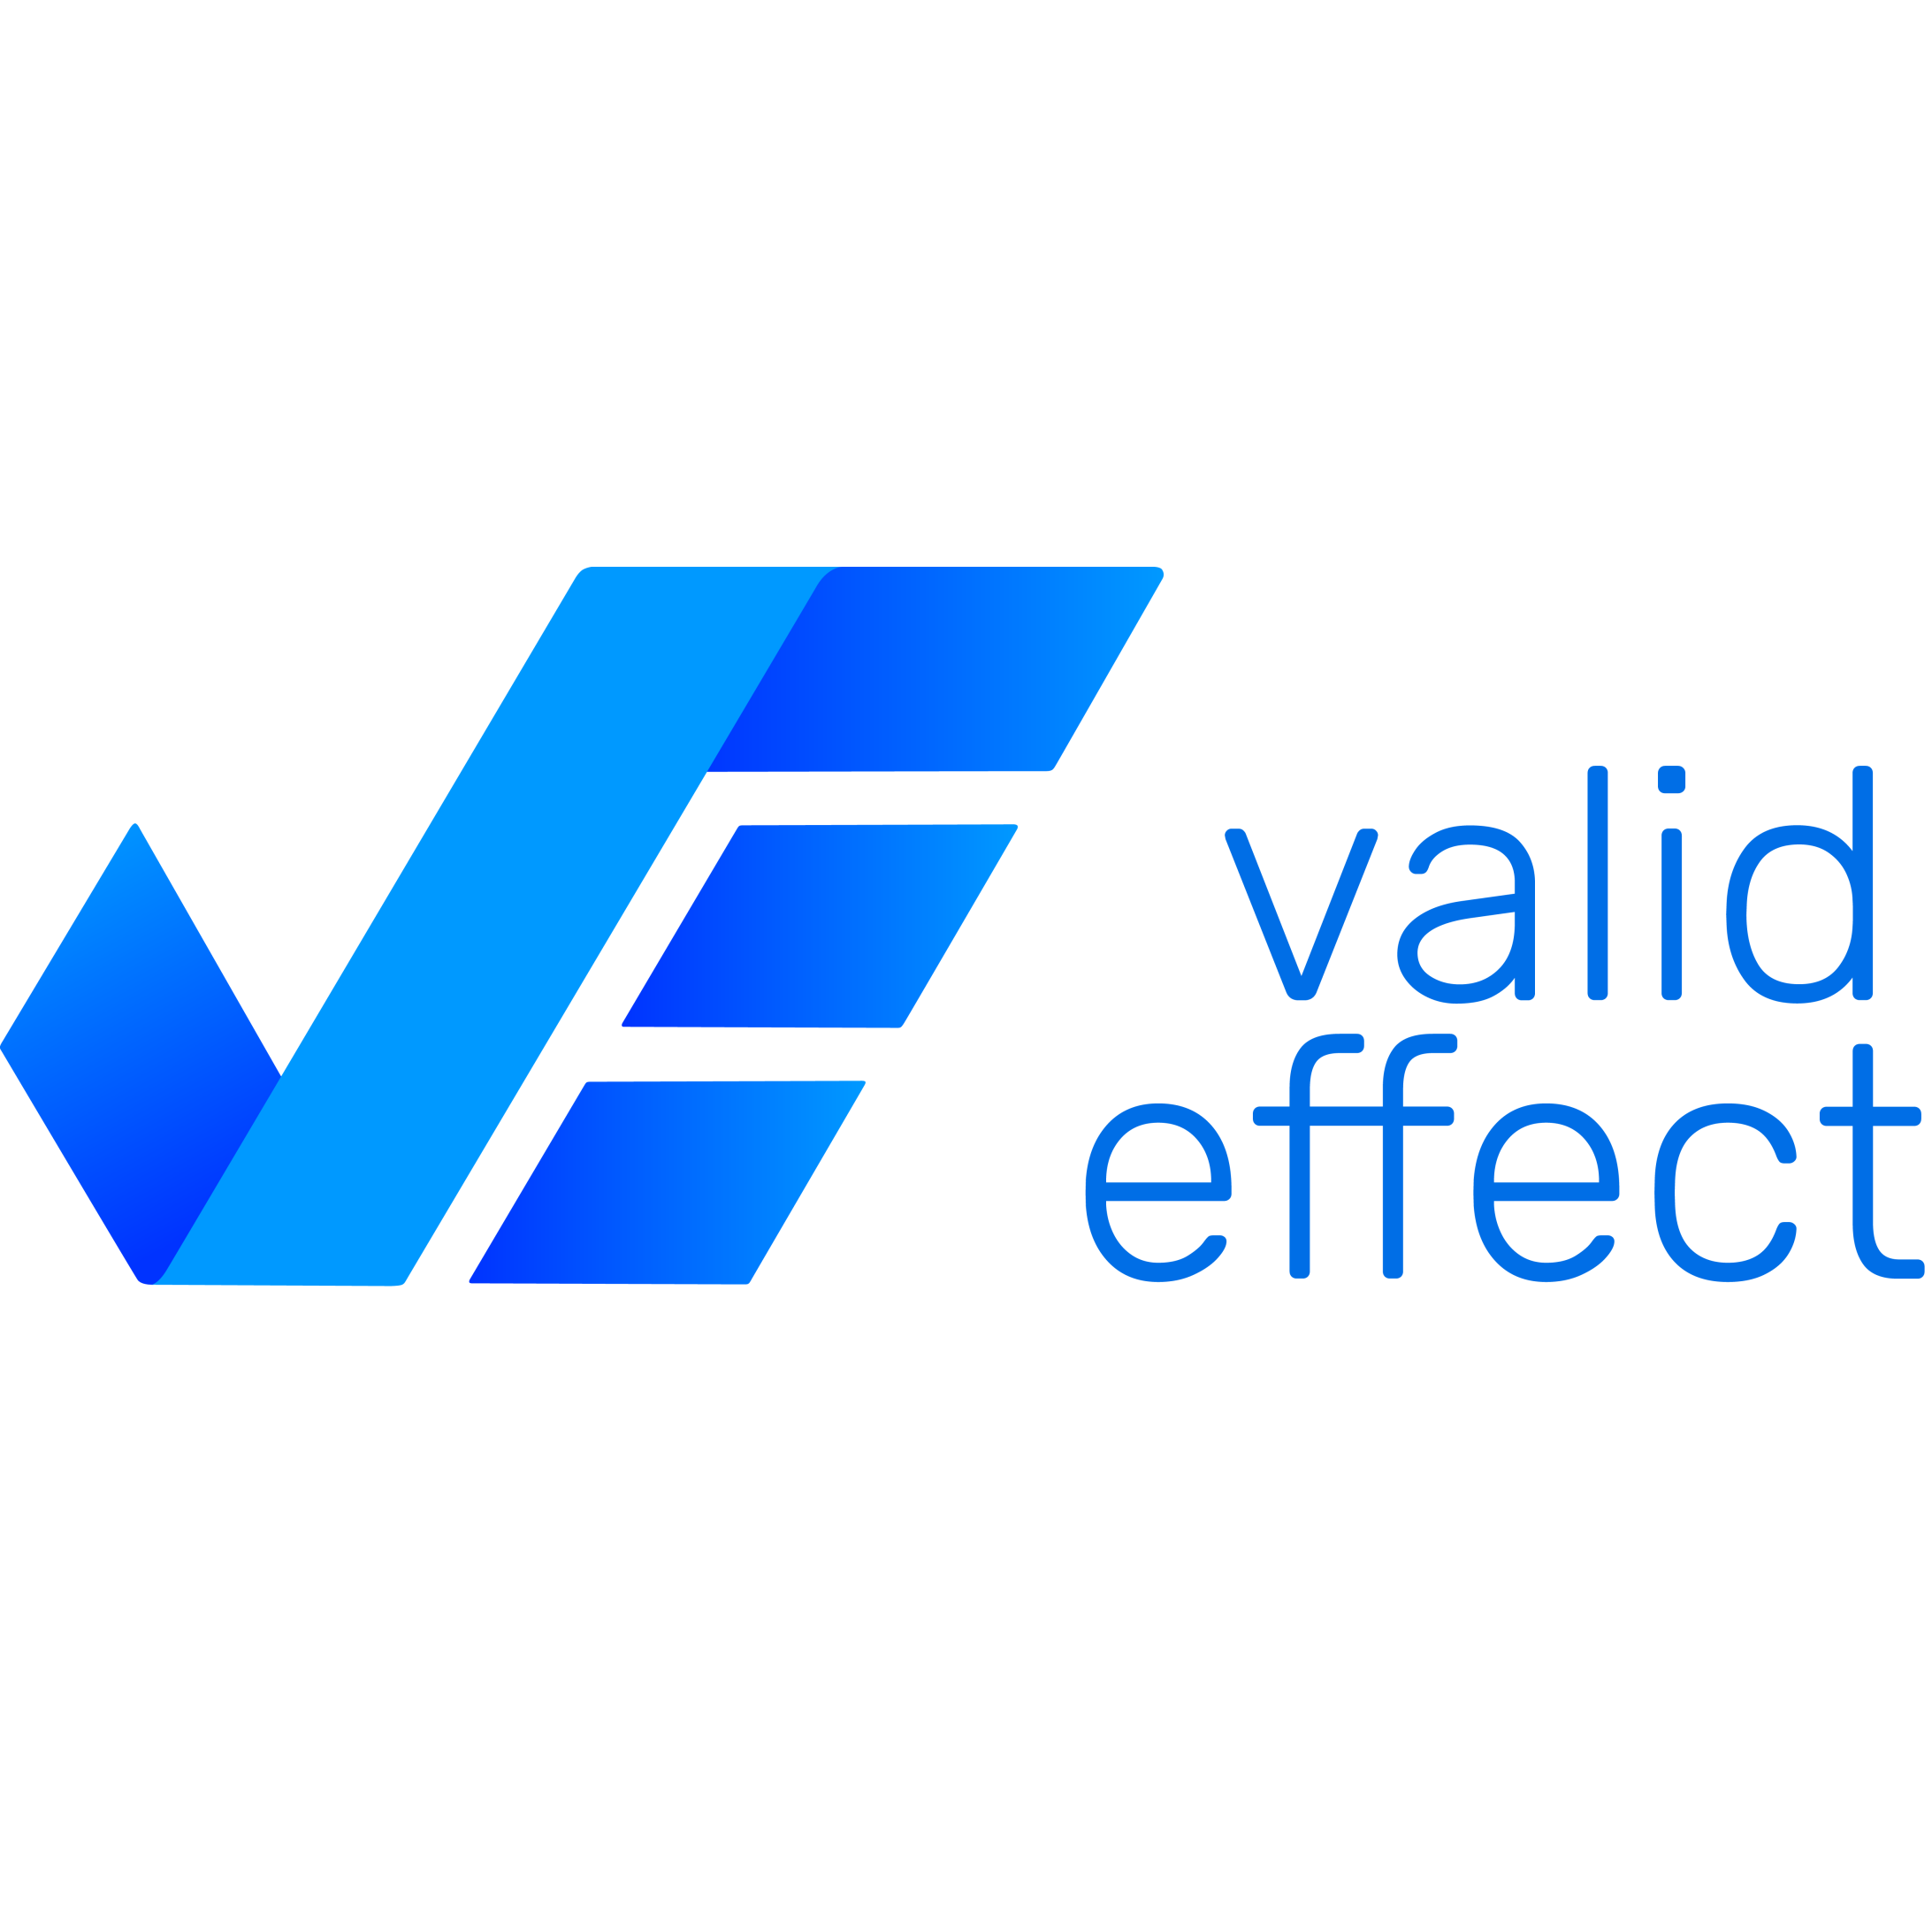 Logo valideffect